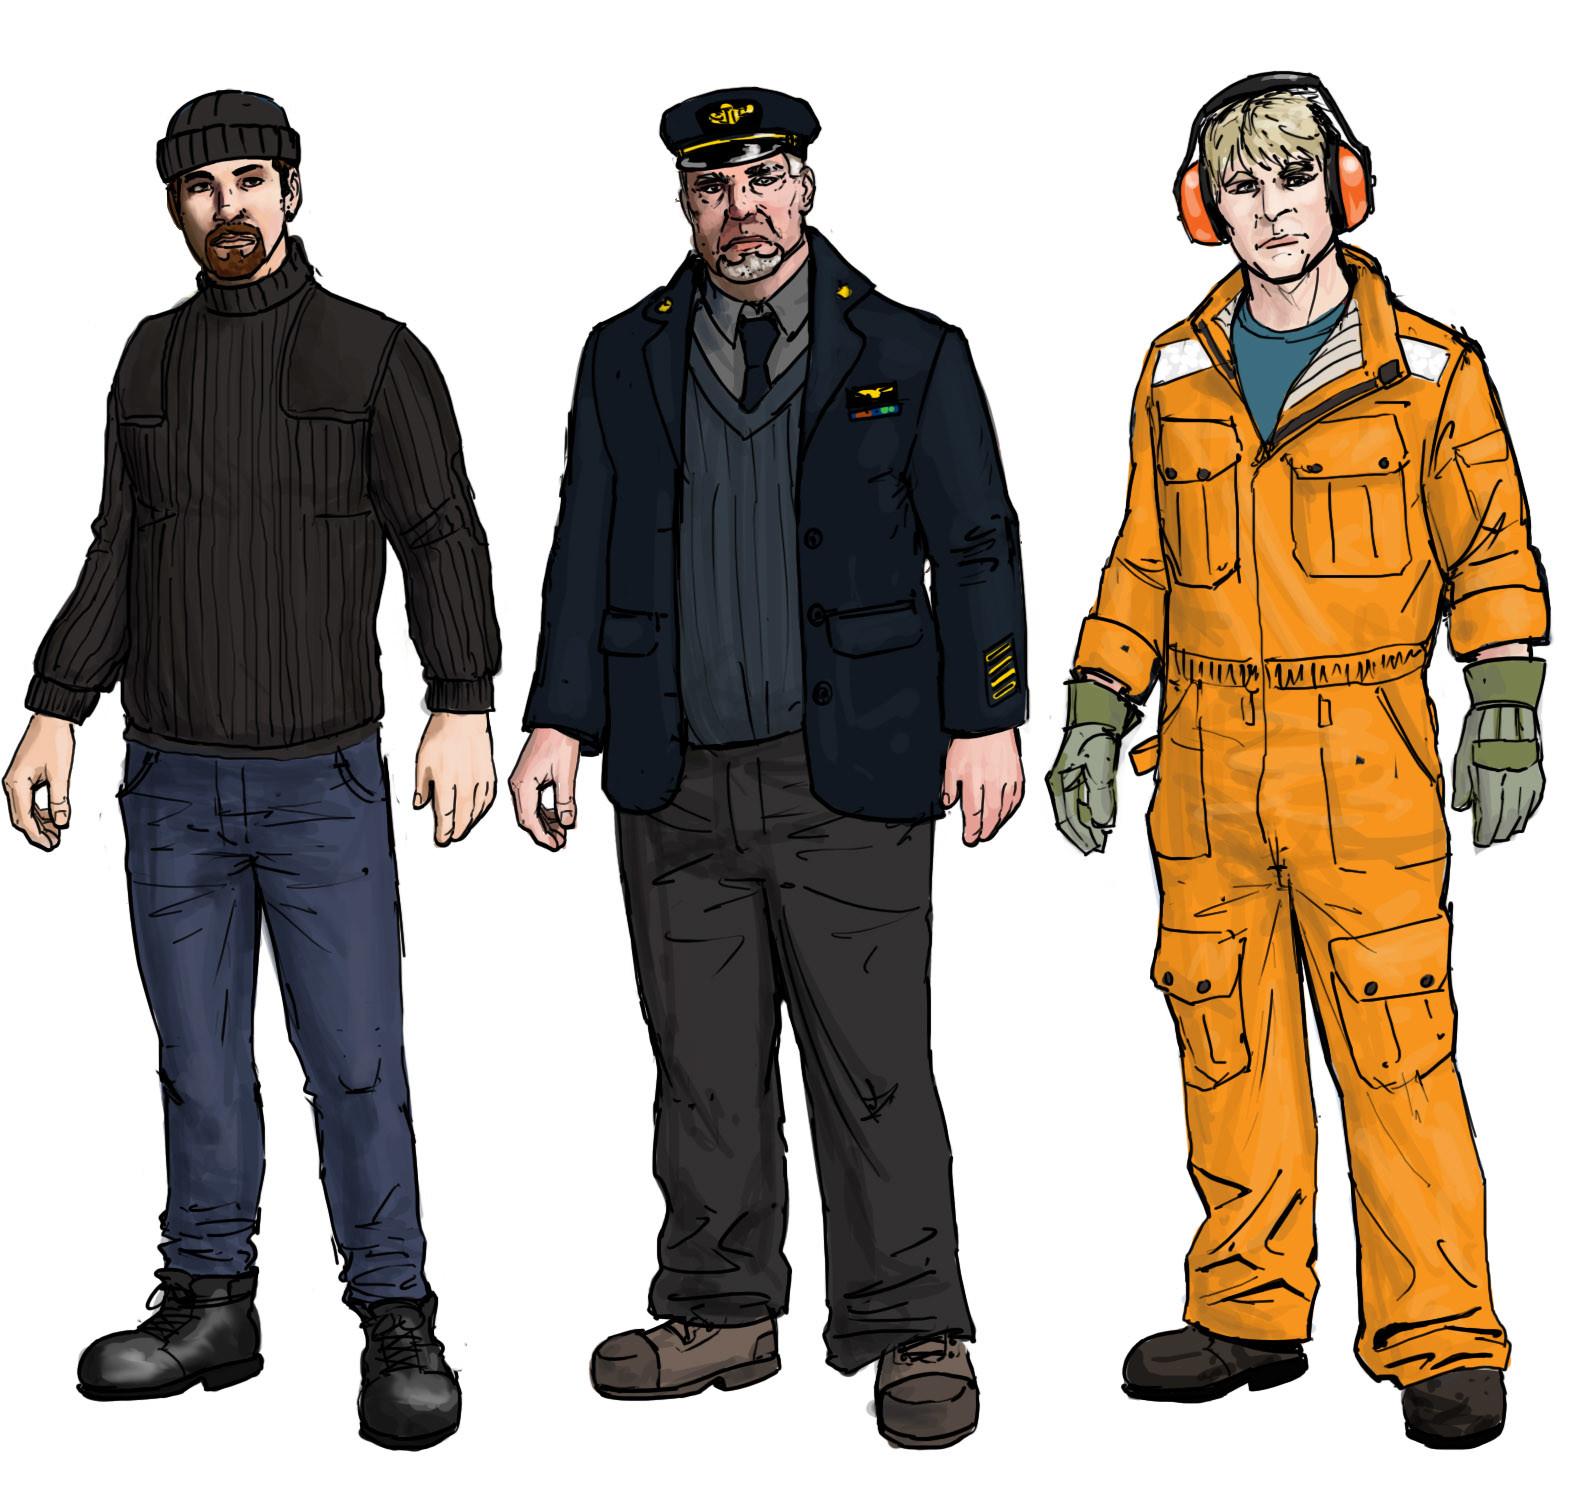 Jeff zugale sop bg dockworker decorators 3